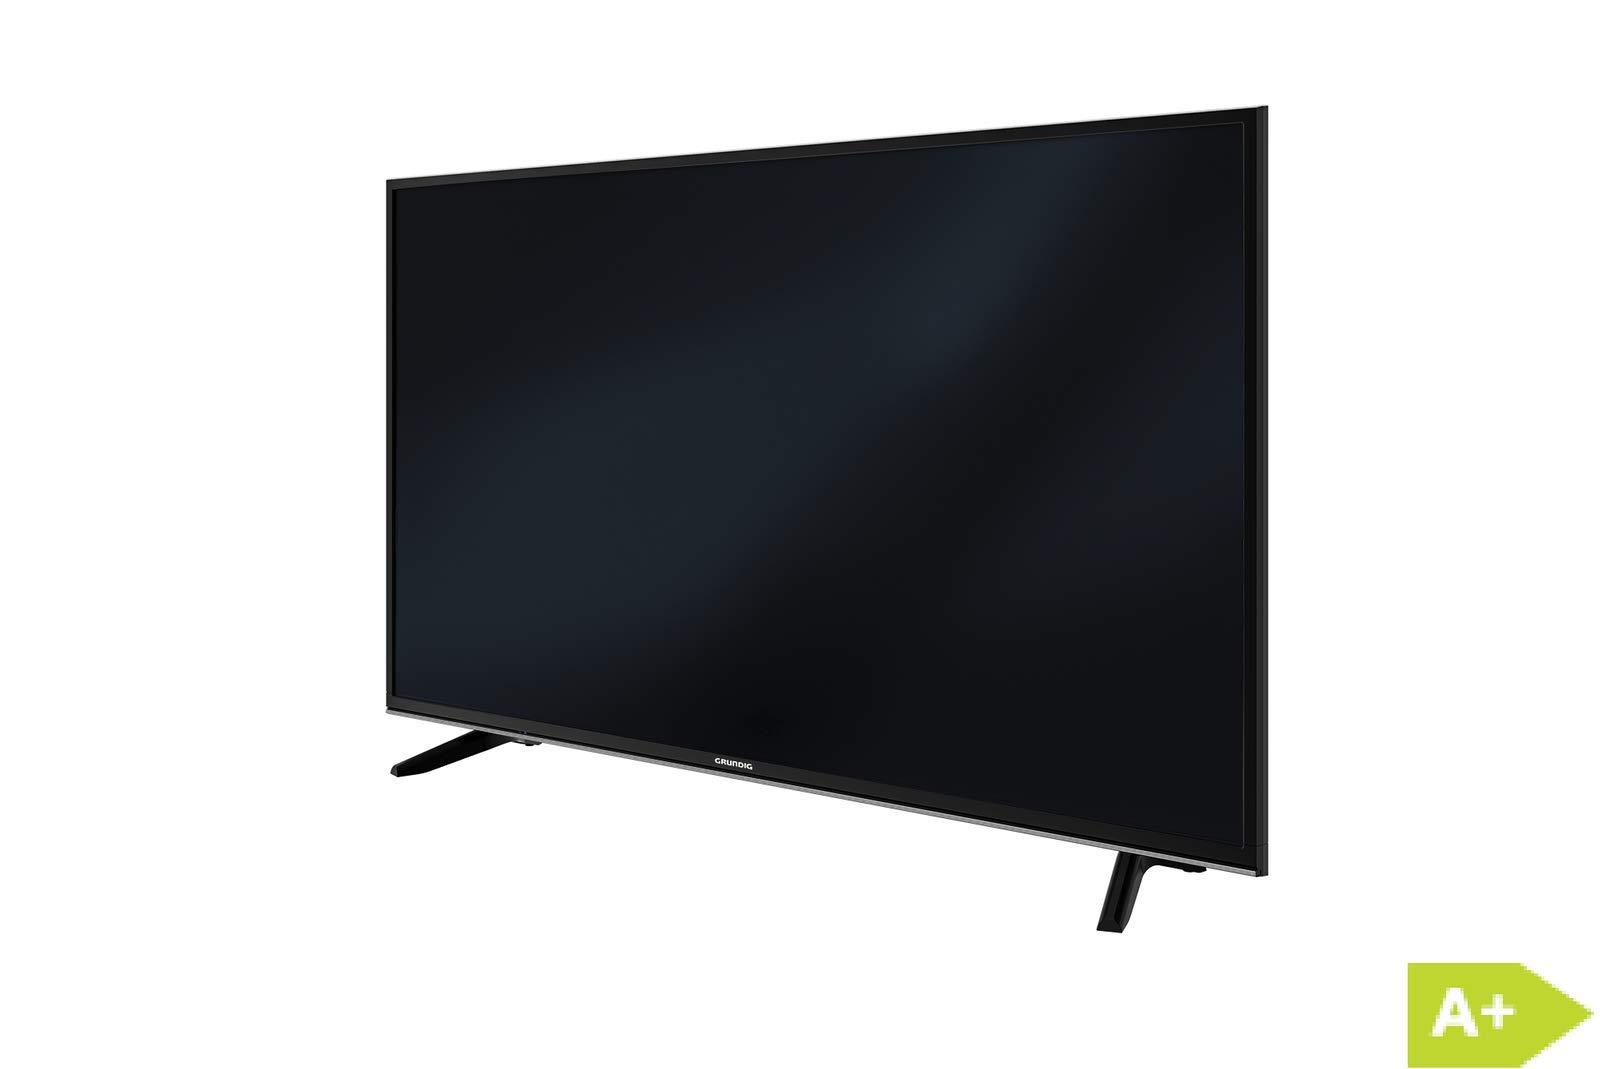 Grundig TV 49GUB7065 FireTVEdition 4KUltraHD Triple Tuner SmartTV ...